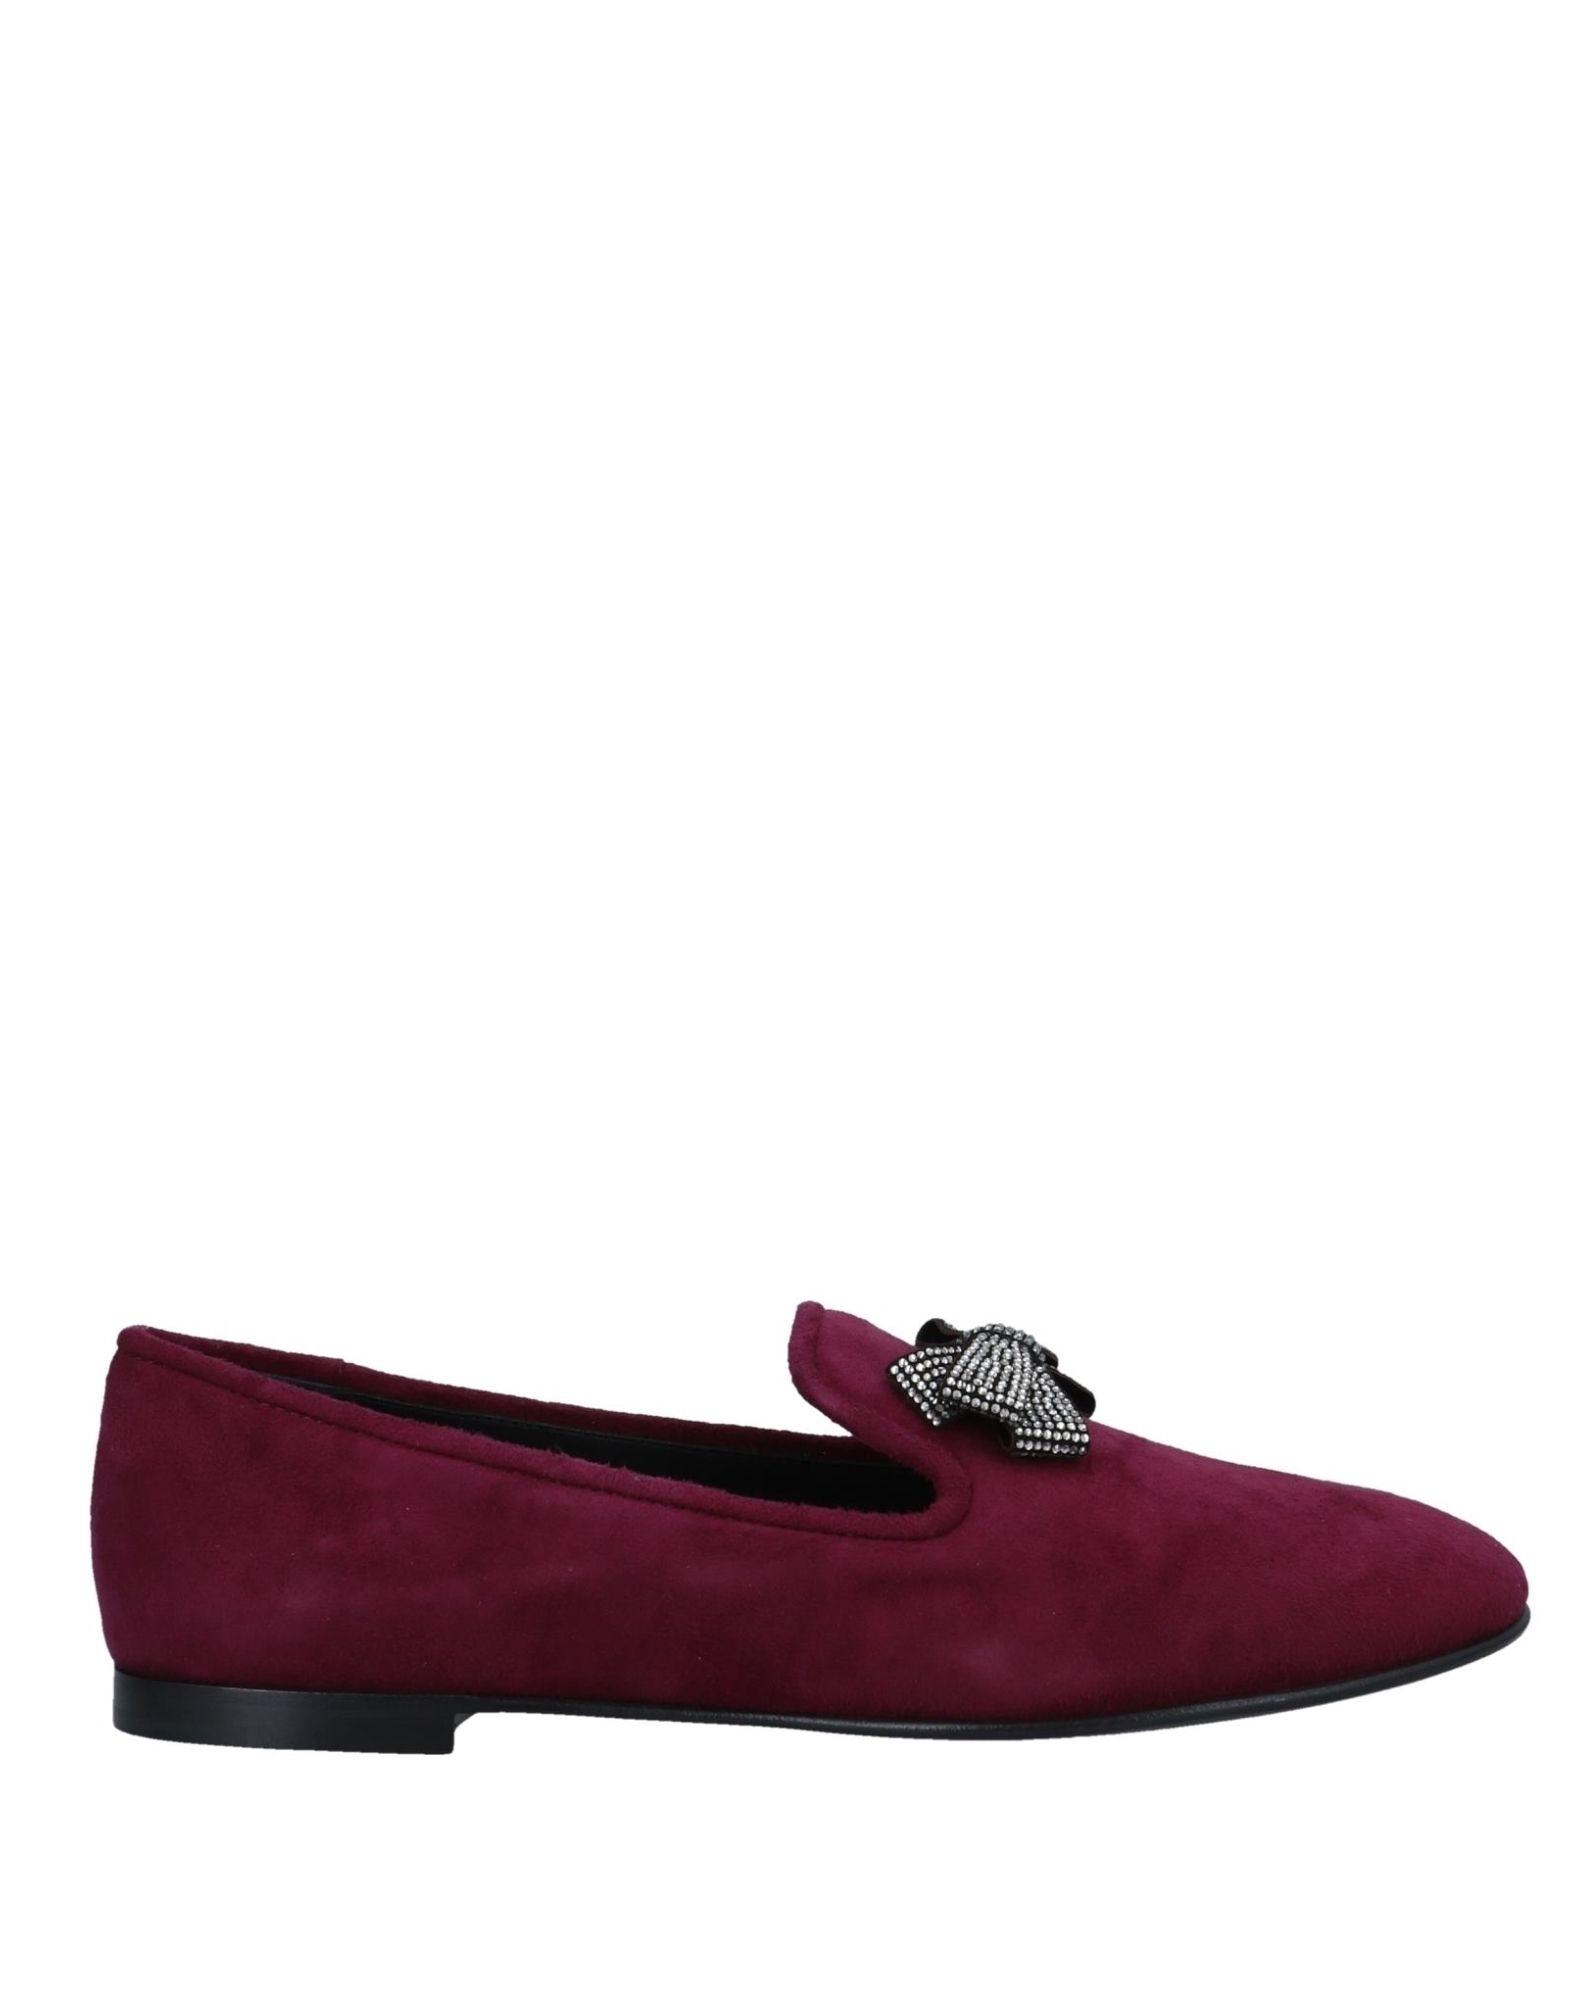 Giuseppe Zanotti Loafers - Women Giuseppe  Zanotti Loafers online on  Giuseppe United Kingdom - 11553591FR e6c3d5